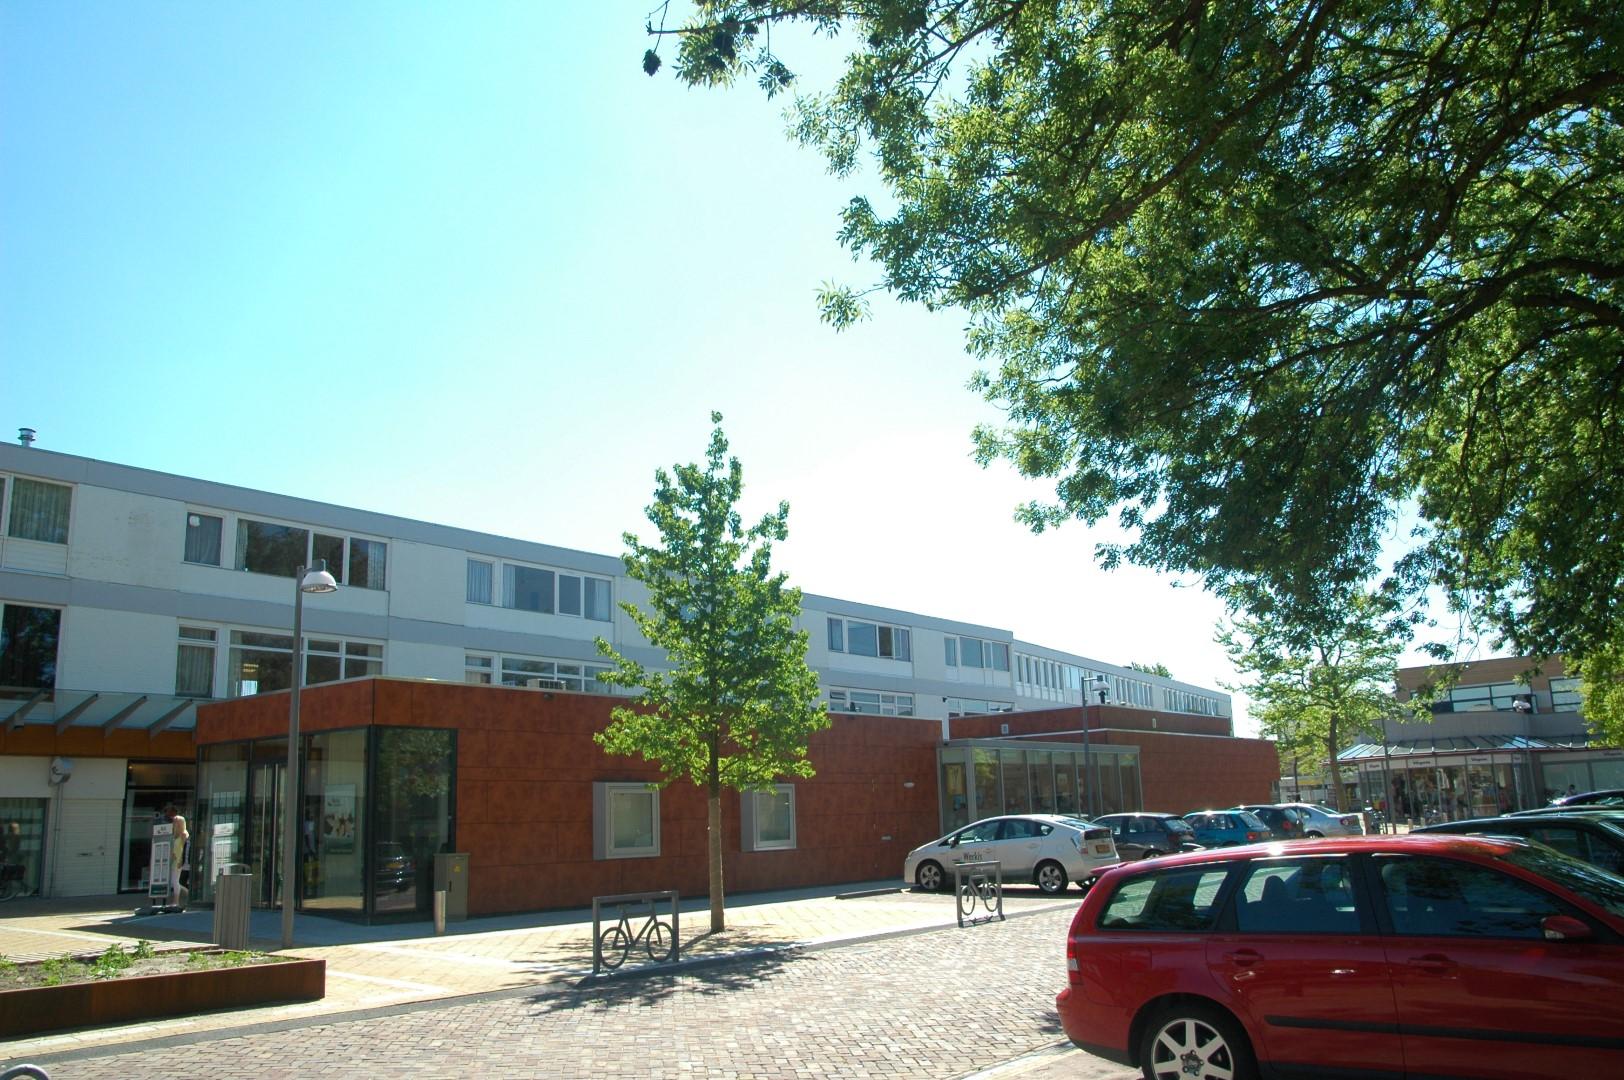 stoel_architect_Kampen_nieuwbouw_winkelcentrum Emmeloord (7) (Large)